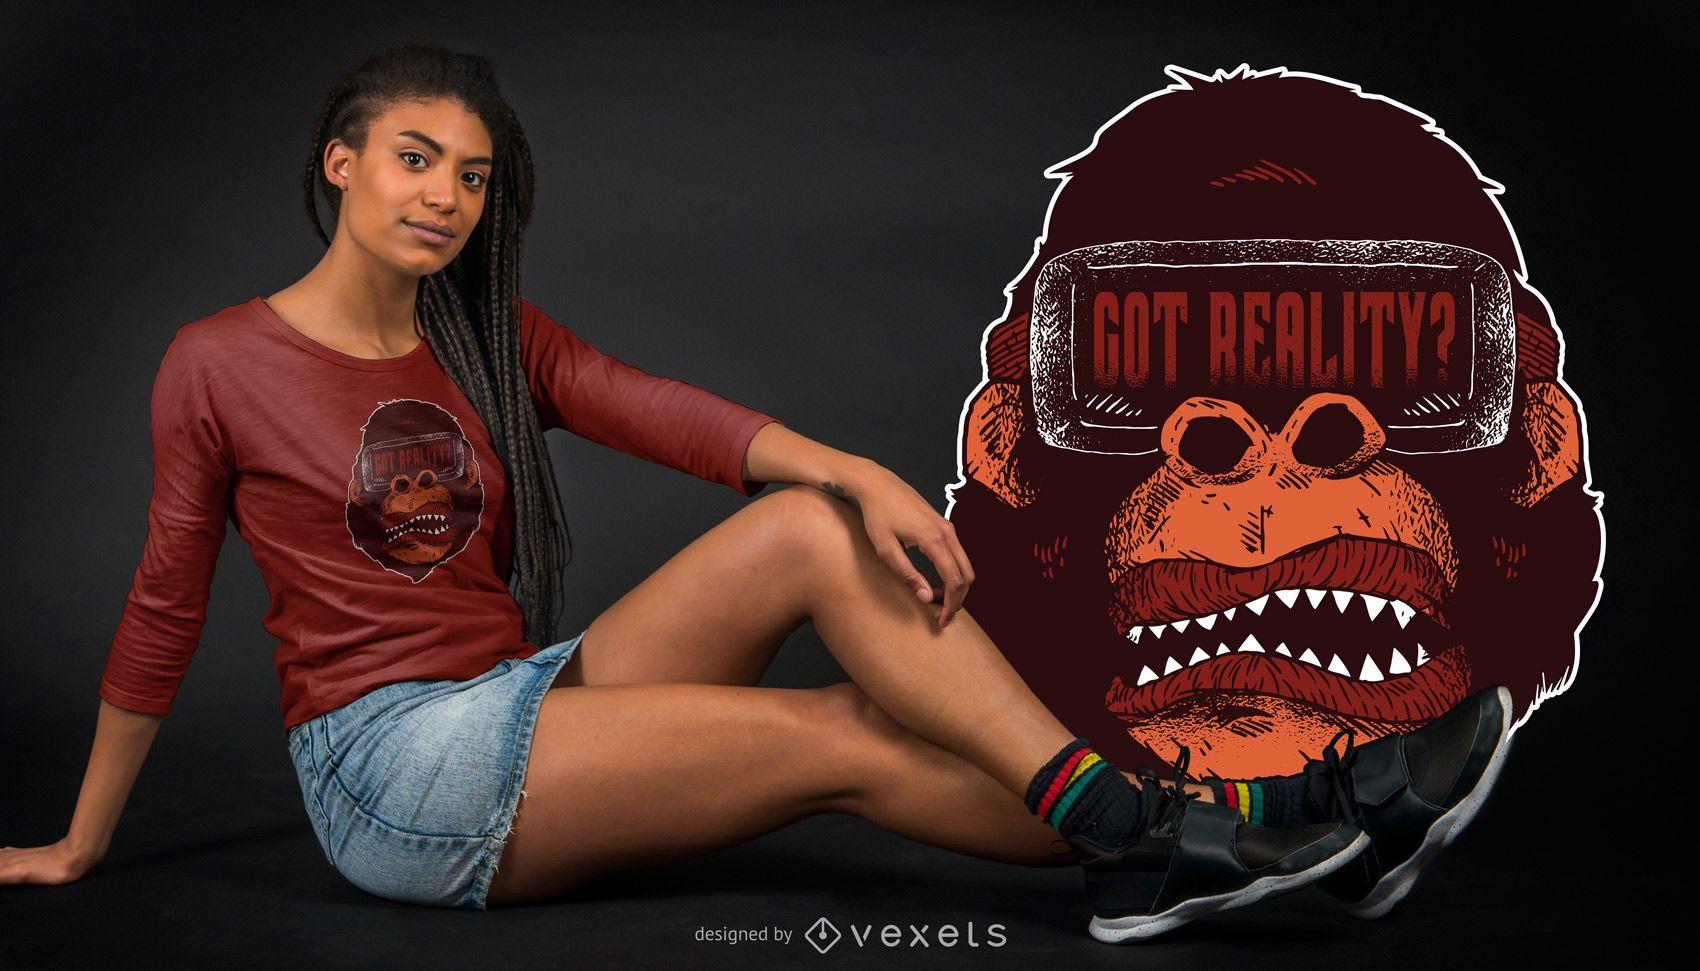 Gorilla reality t-shirt design